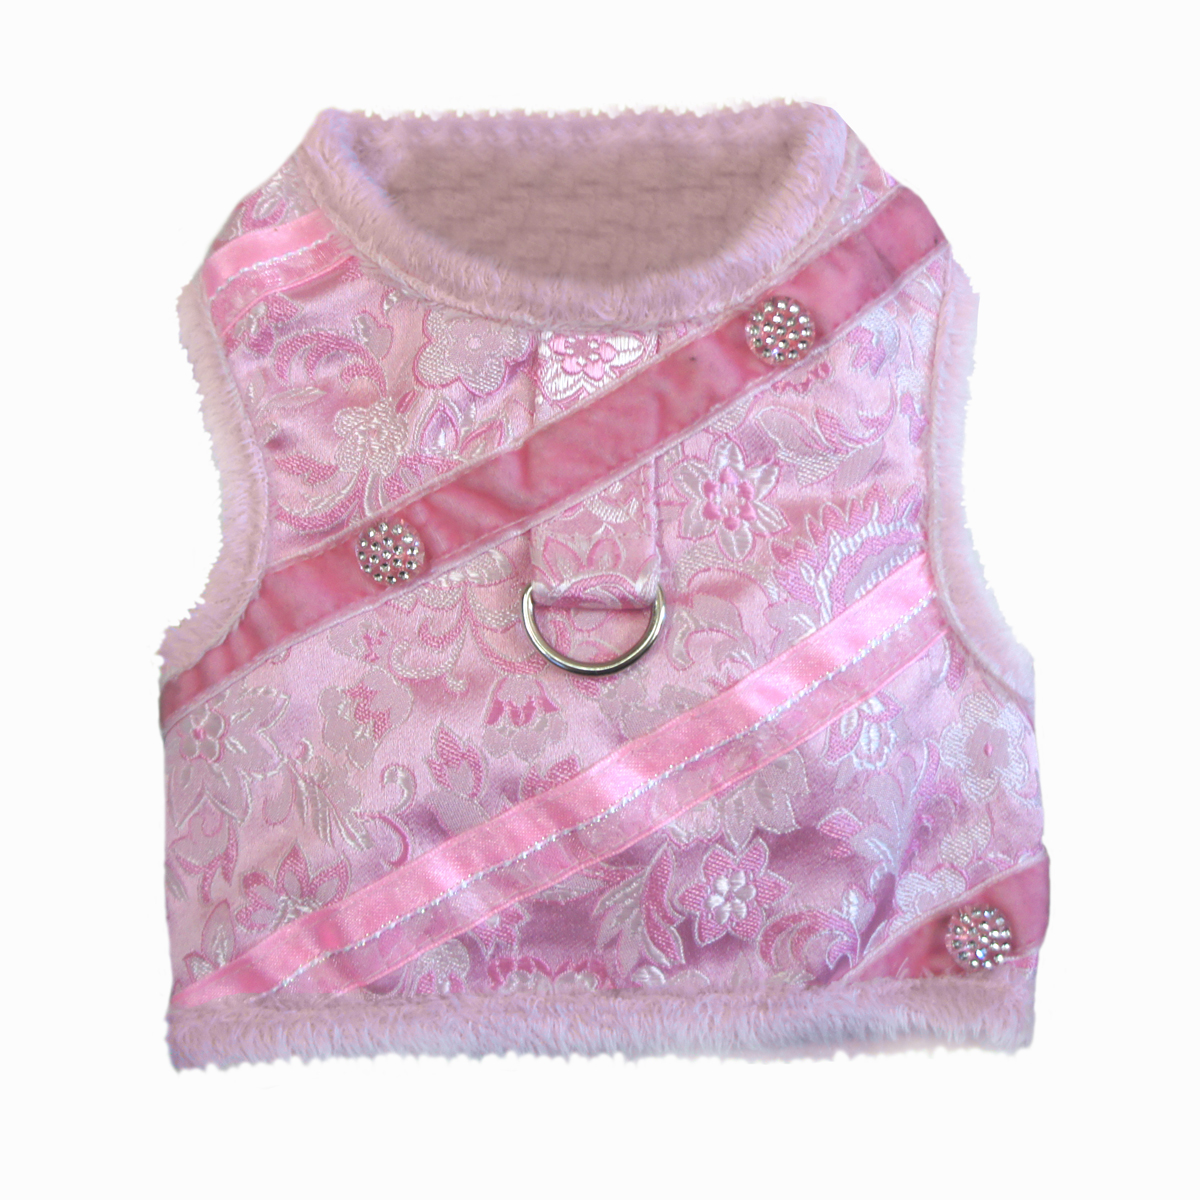 Pink Brocade Minky Plush Dog Harness with Leash